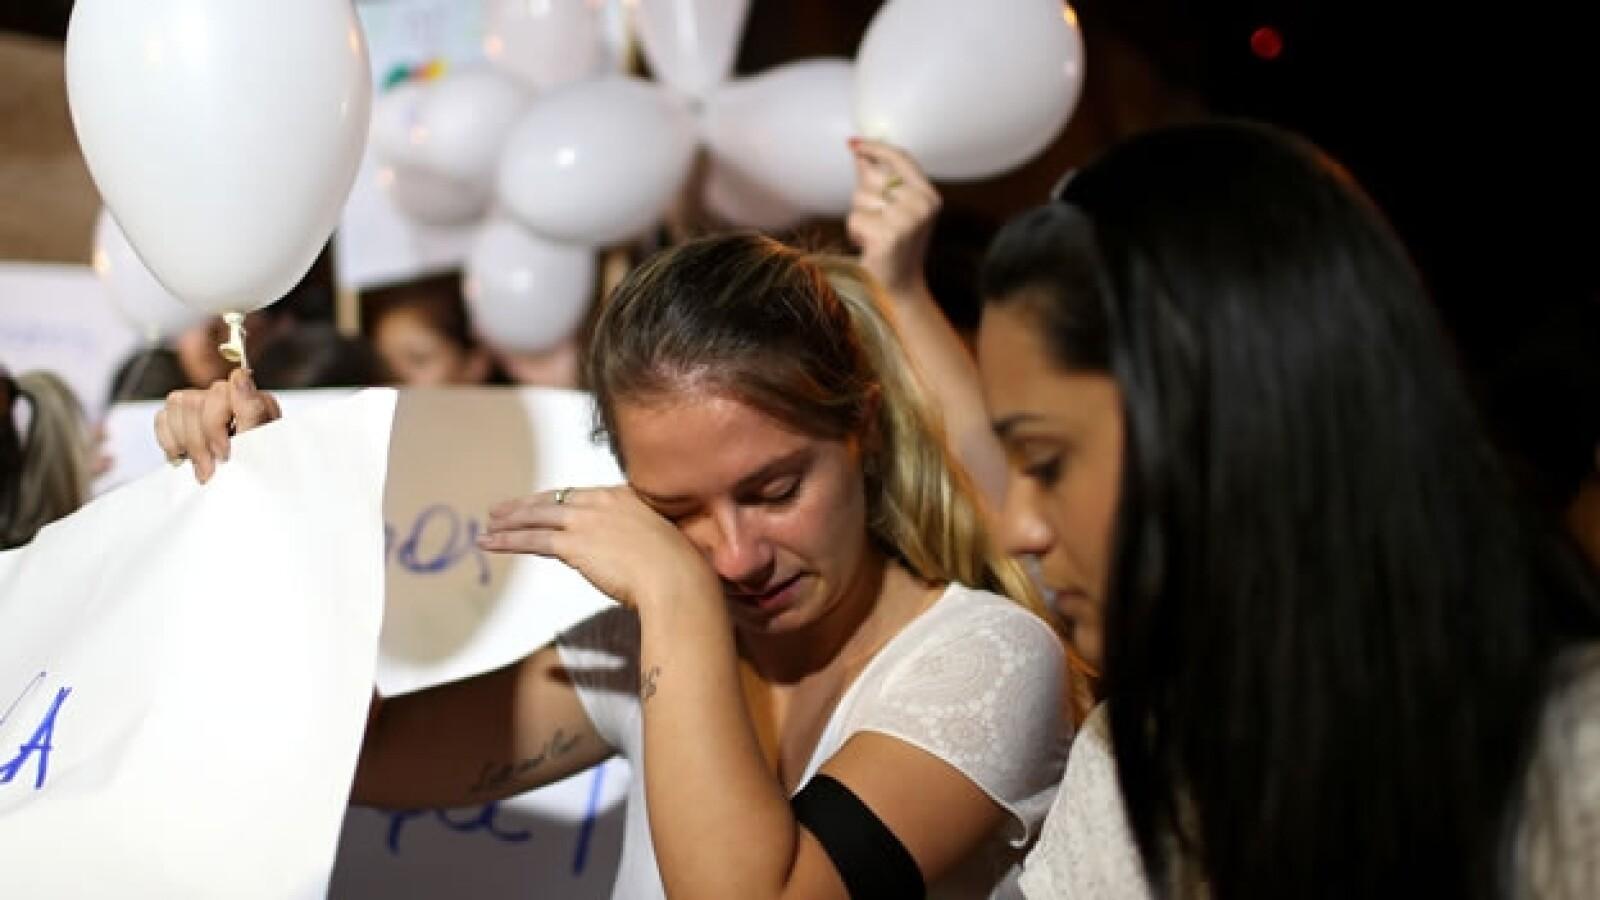 Brasil marcha victimas discoteque Kiss